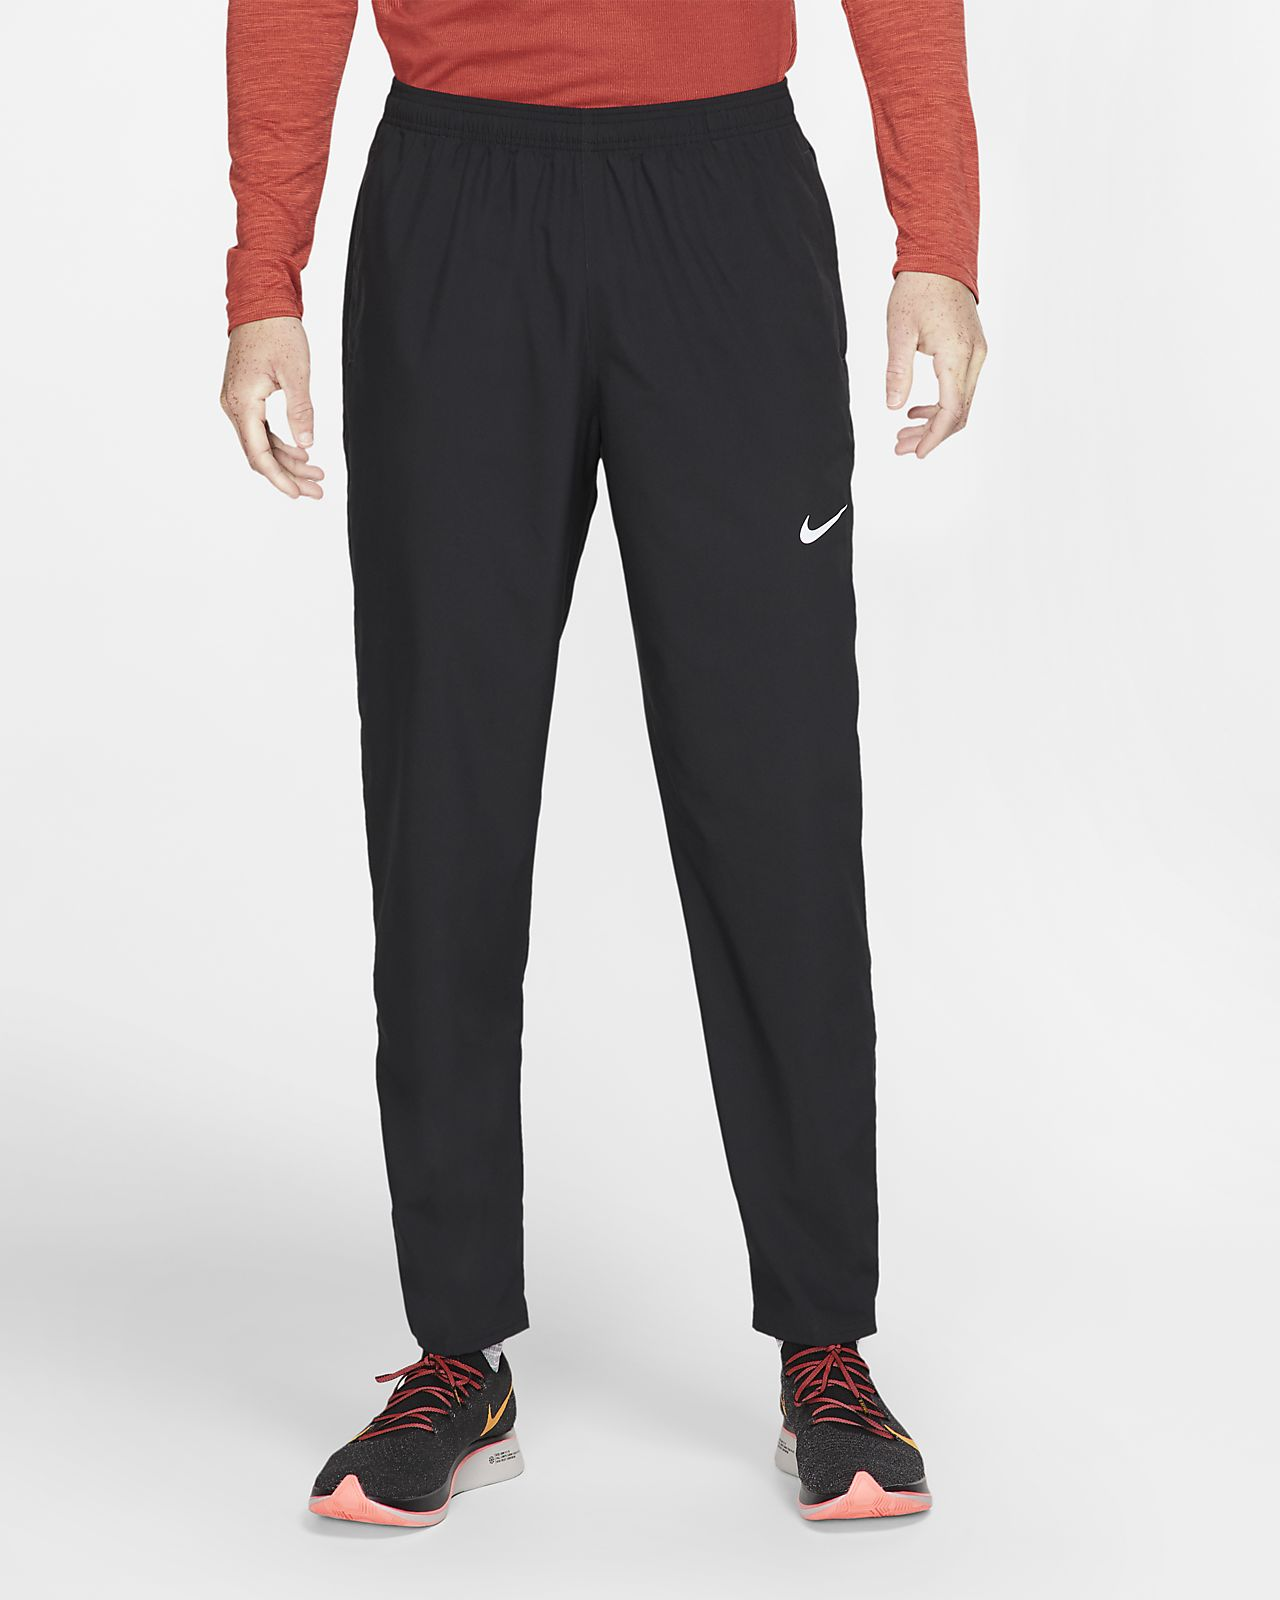 Pantalones tejidos de running para hombre Nike